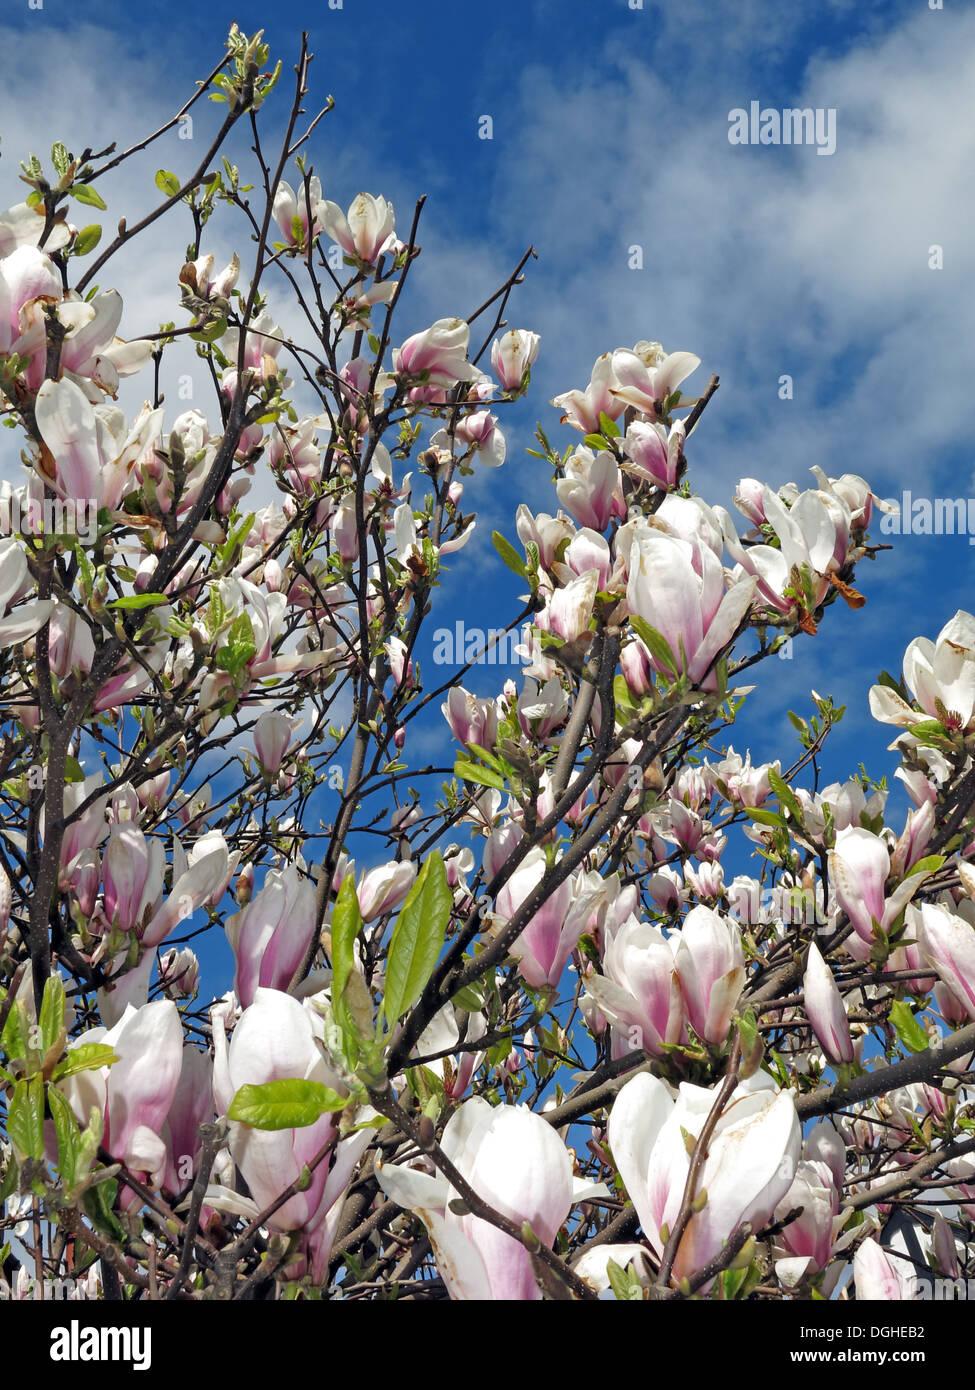 Magnolia shrub flowers cream in Spring season Europe - Stock Image